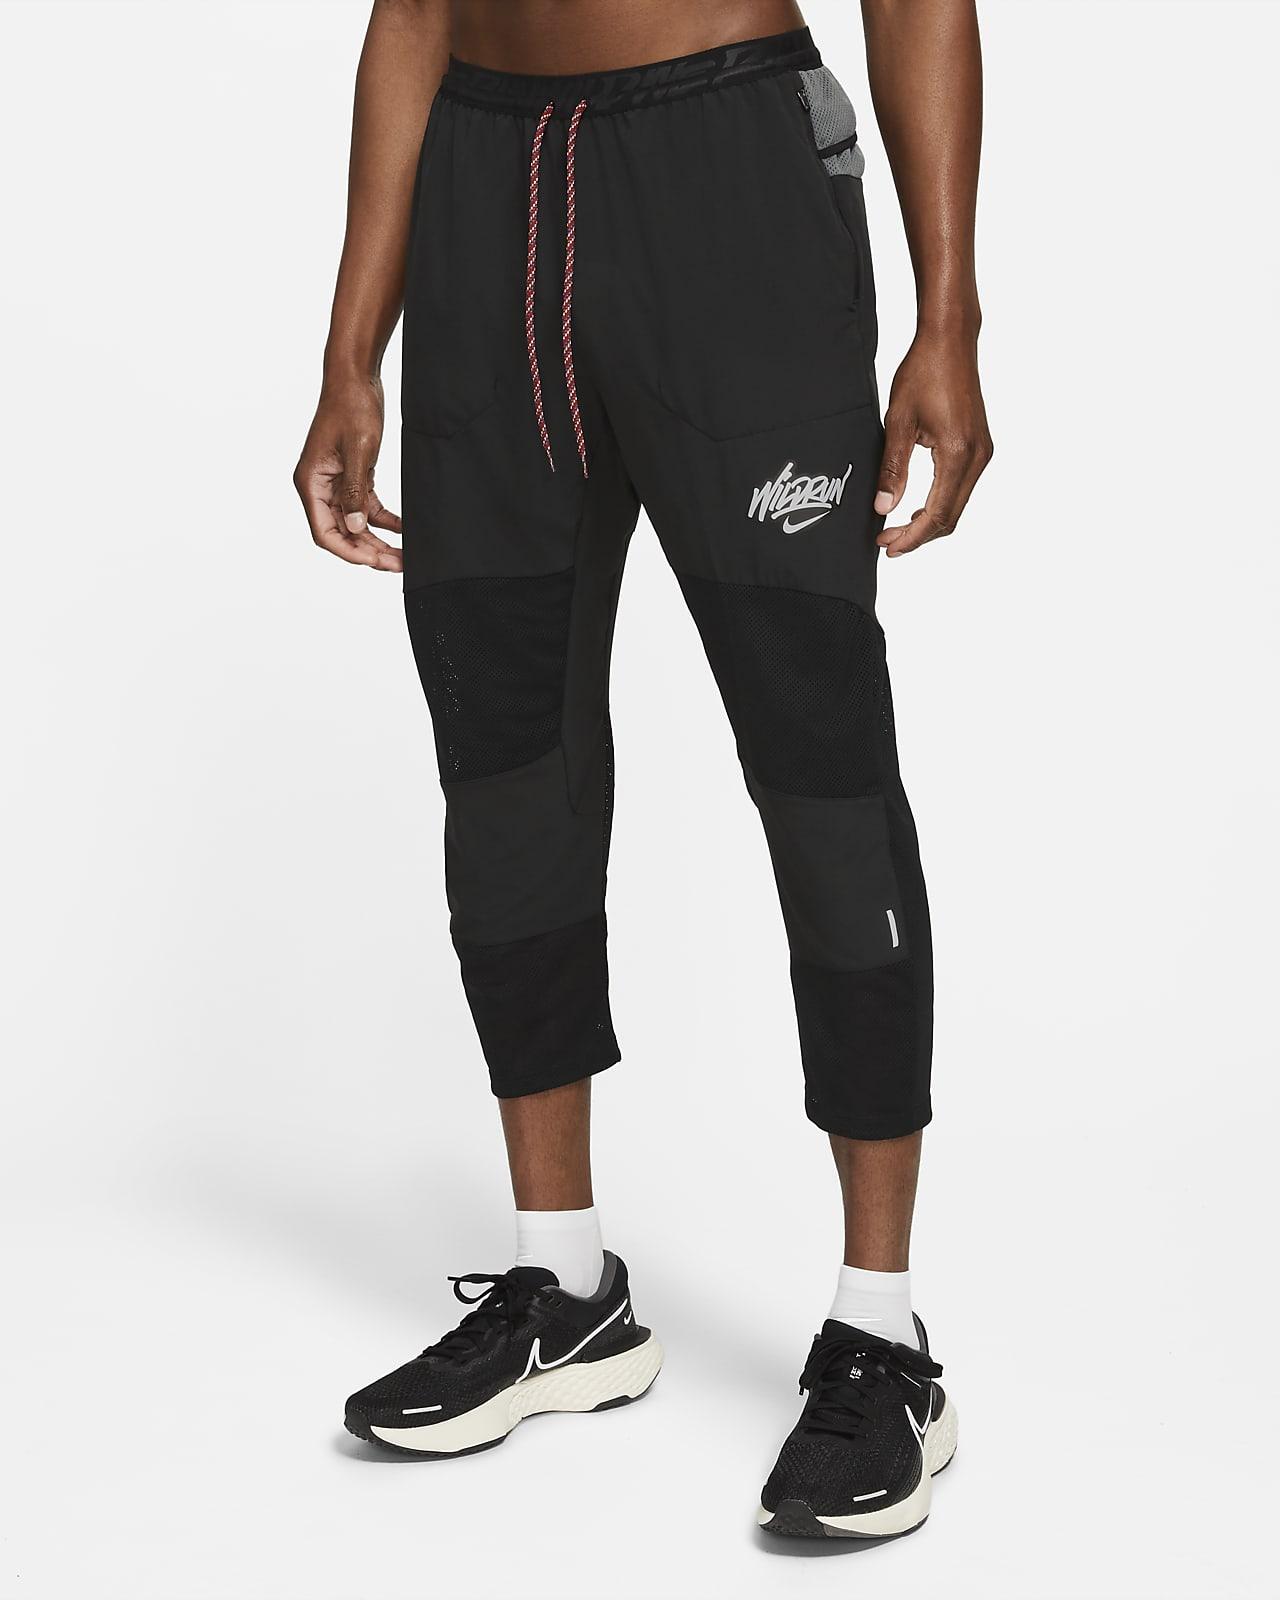 Pantalon de running tissé7/8 Nike Phenom Elite Wild Run pour Homme